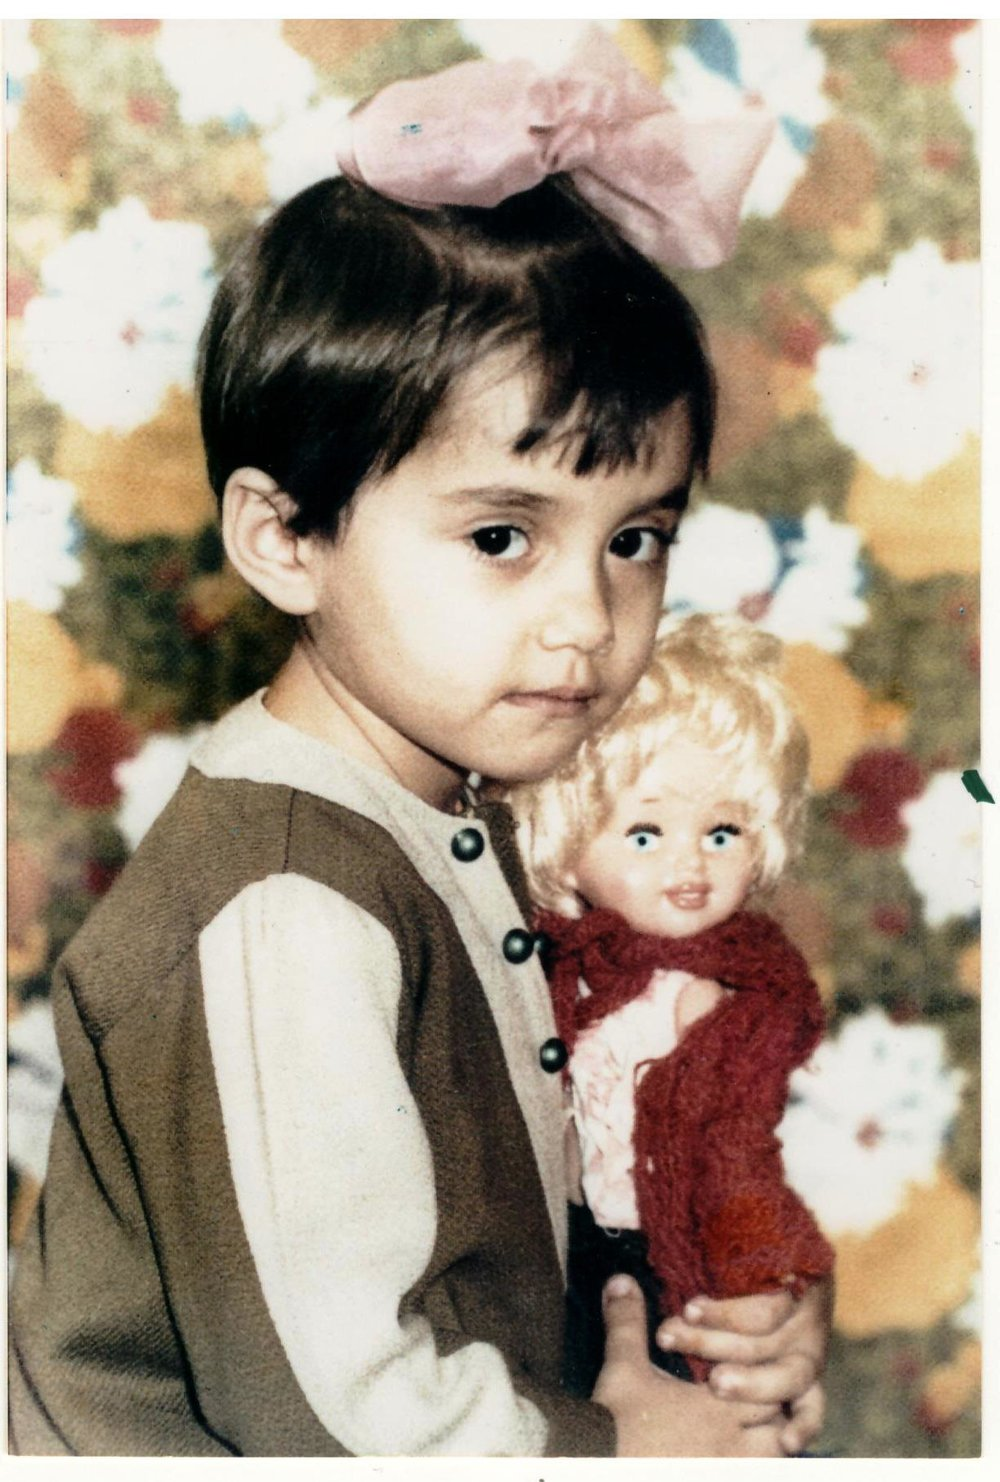 Nursery school photo, age 4 - Leningrad